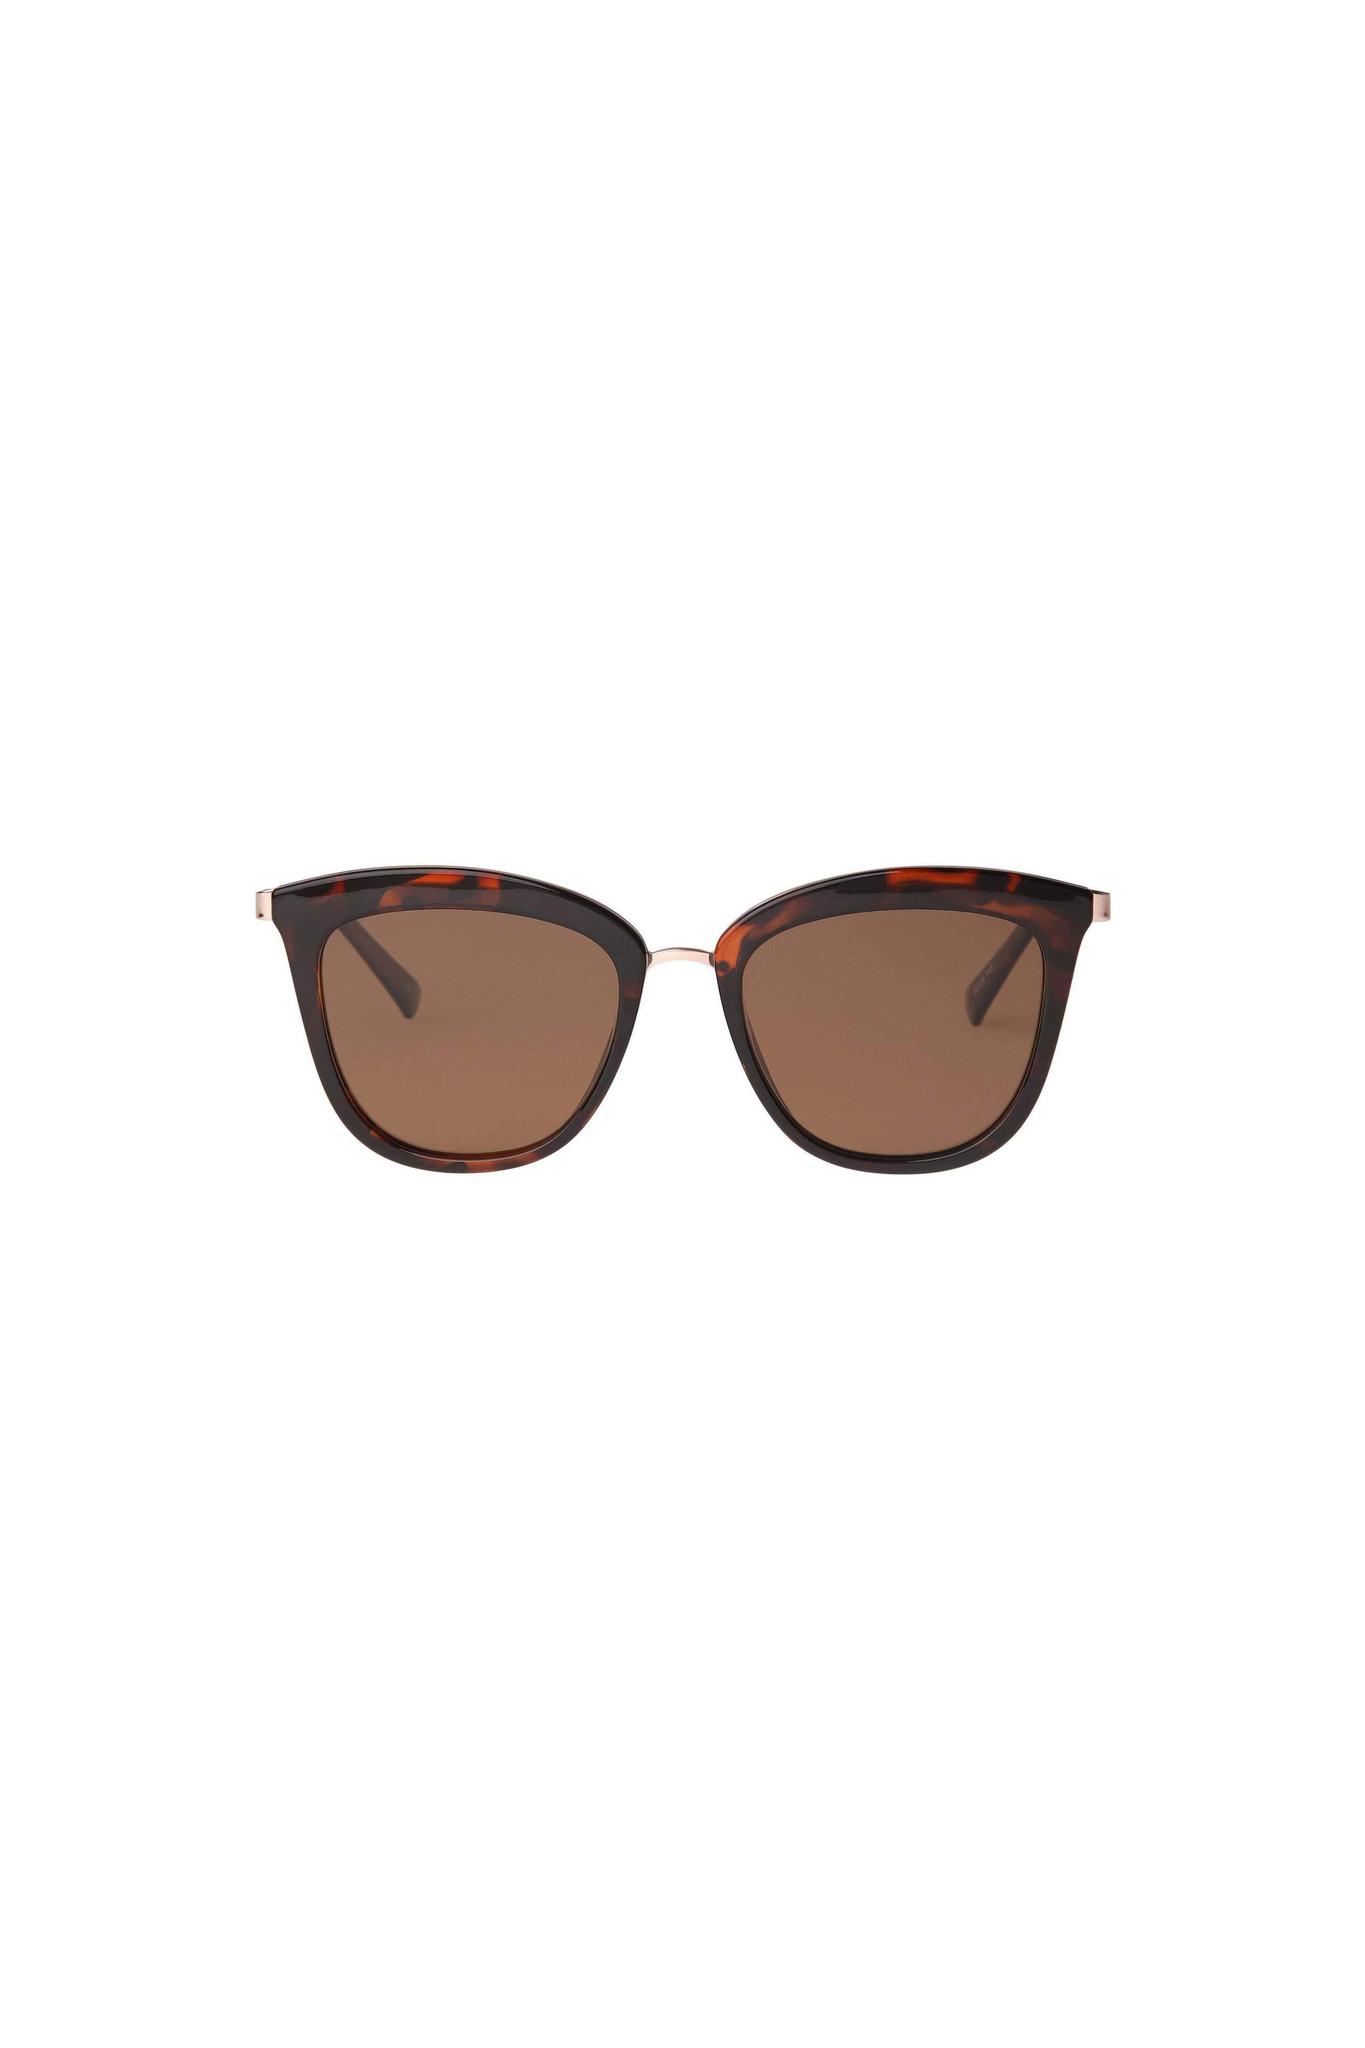 Caliente *Polarized* Sunglasses - Tortoise-1